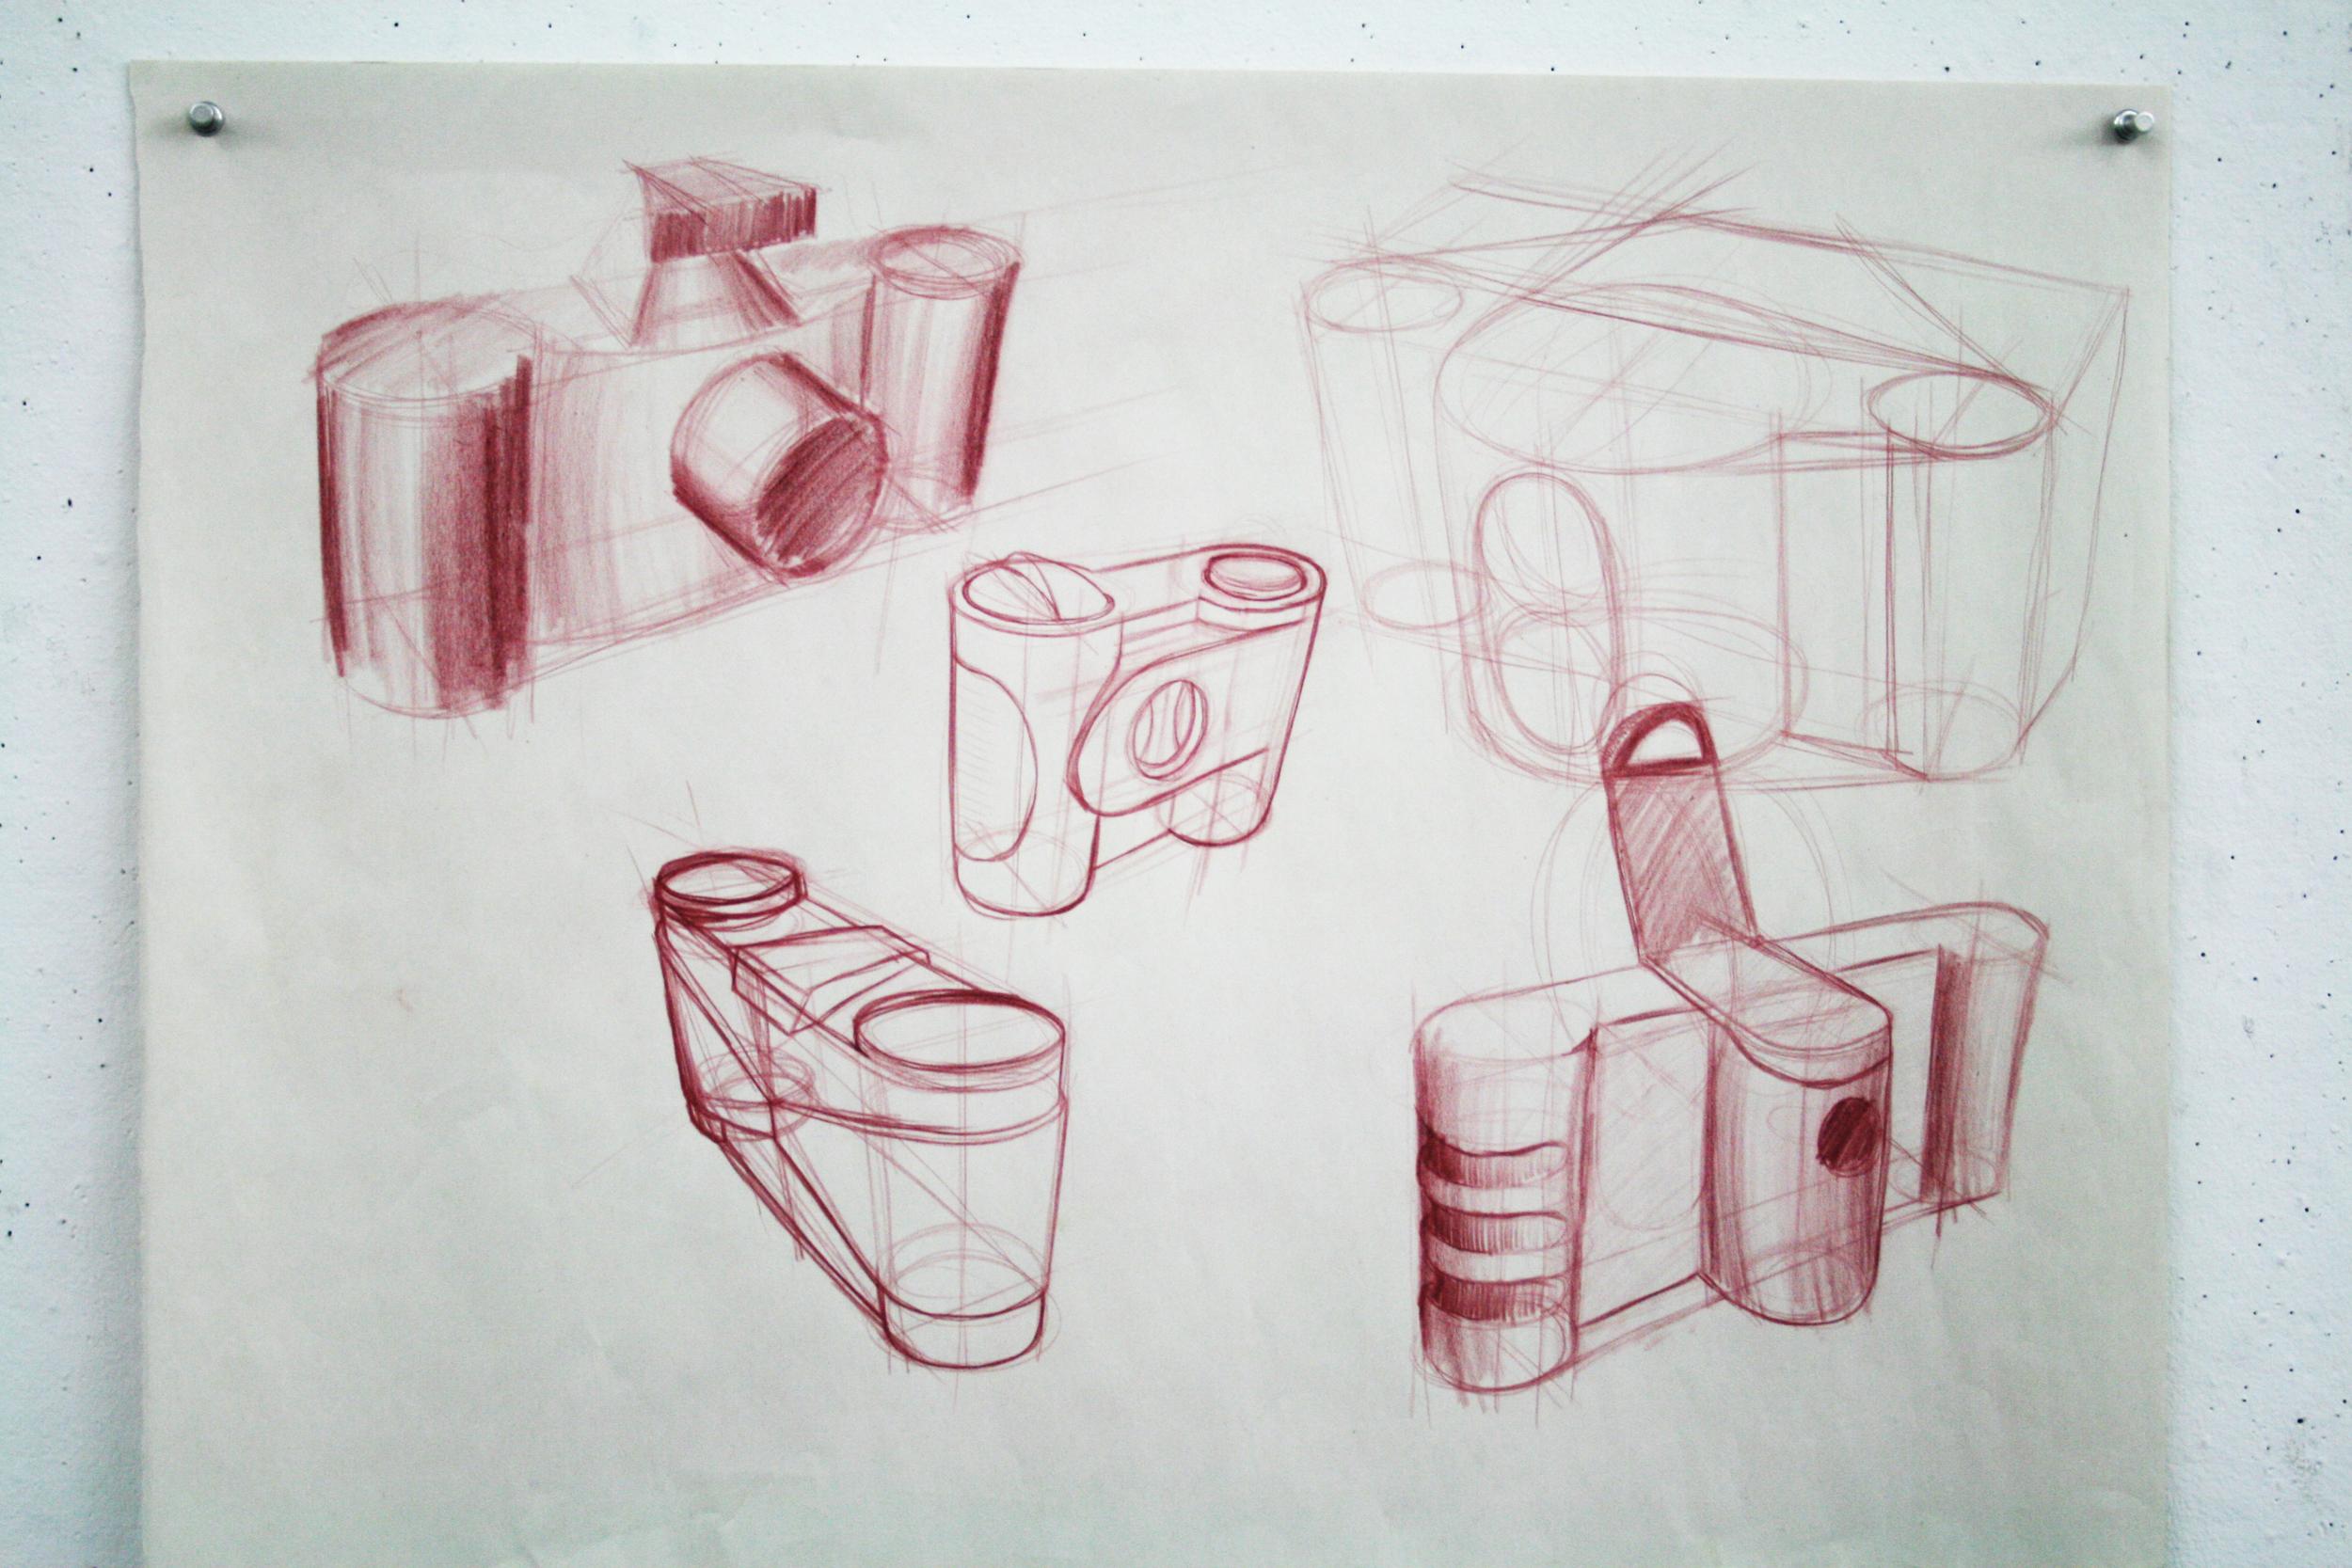 Camera ideation